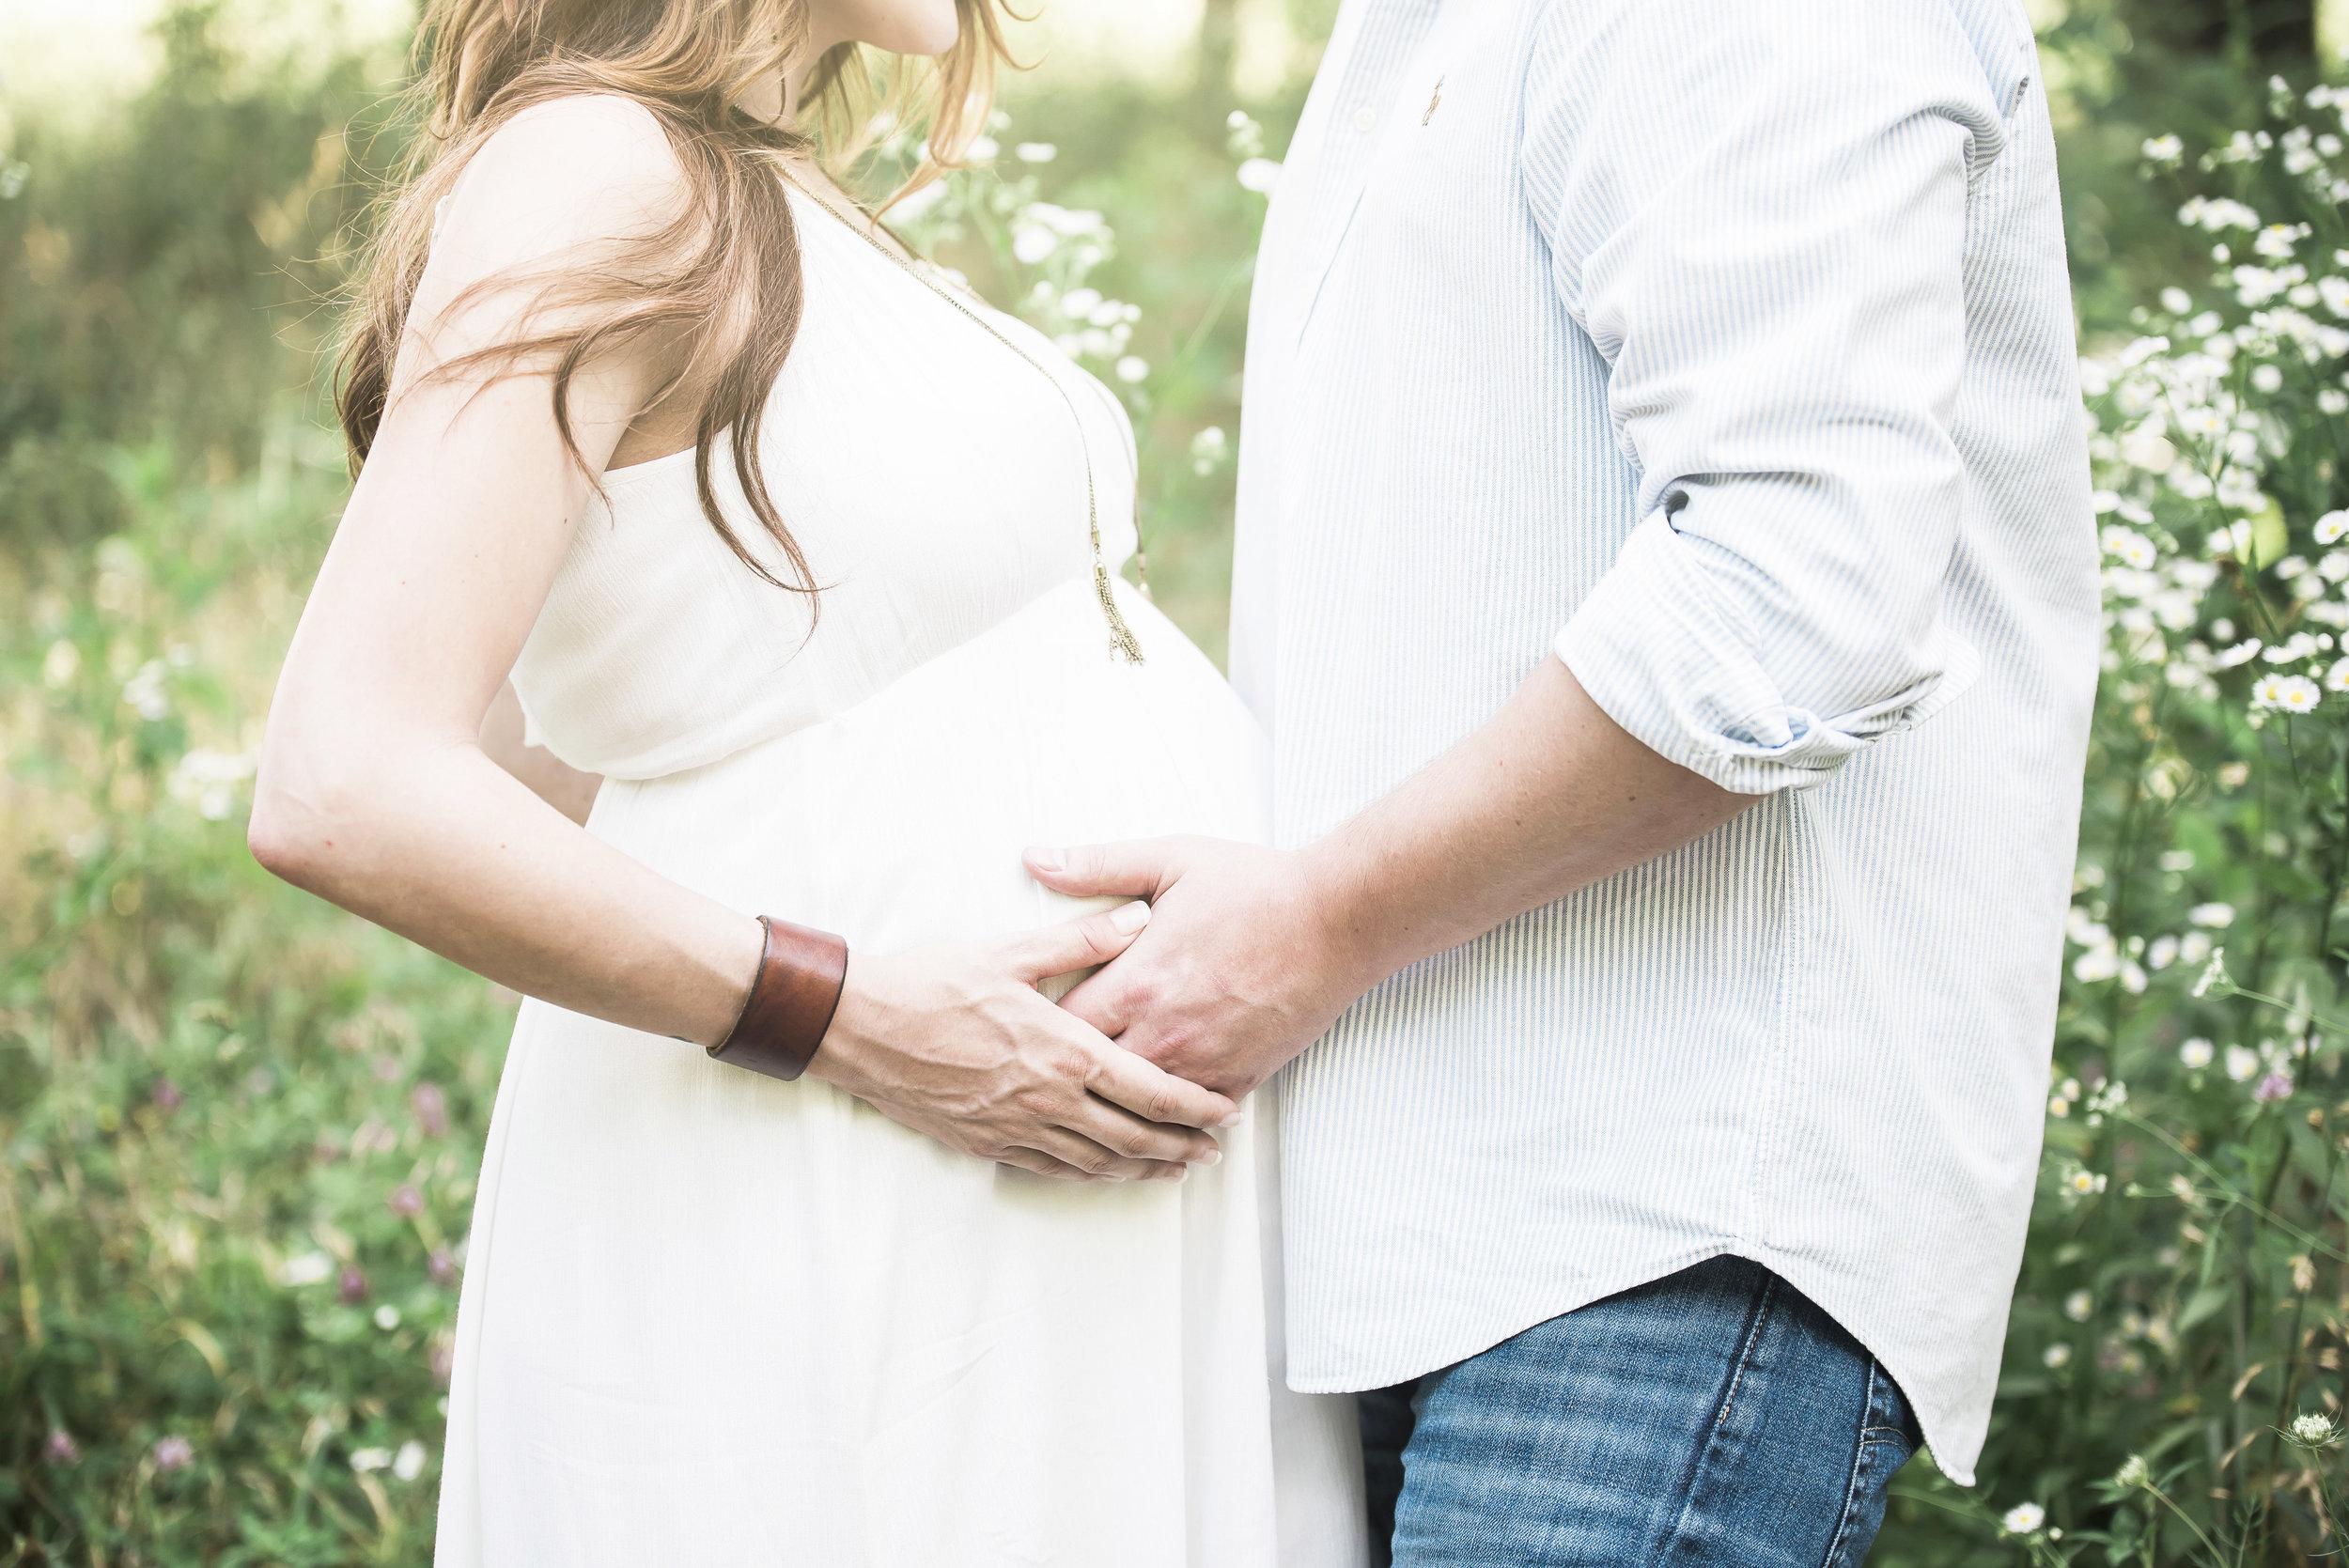 Leslie Mitch Huffman Maternity-Leslie Mitch Huffman Maternity-0008 copy.jpg